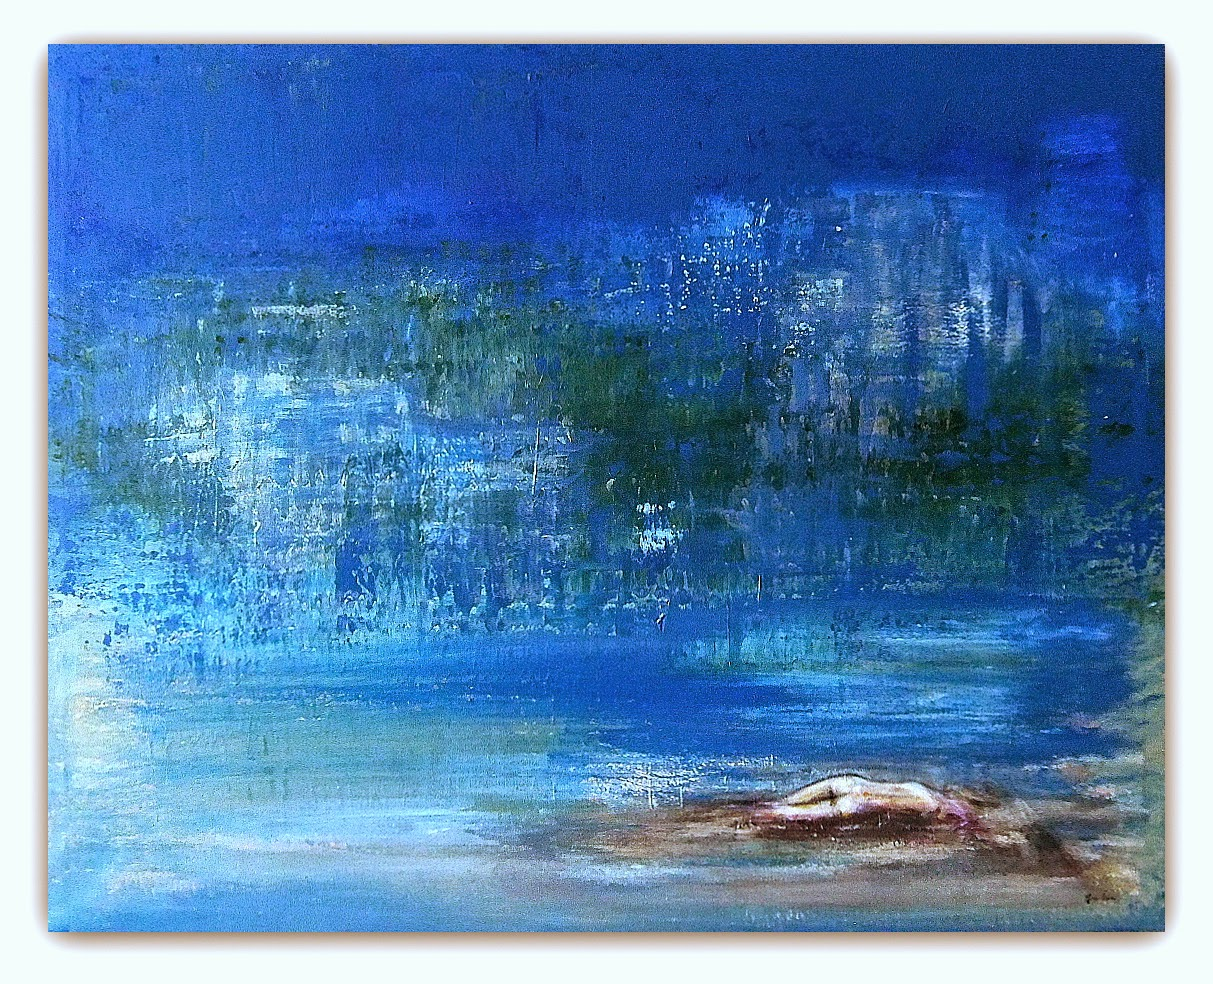 Quadri moderni astratti dipinti sanader art pittura for Quadri dipinti a mano paesaggi